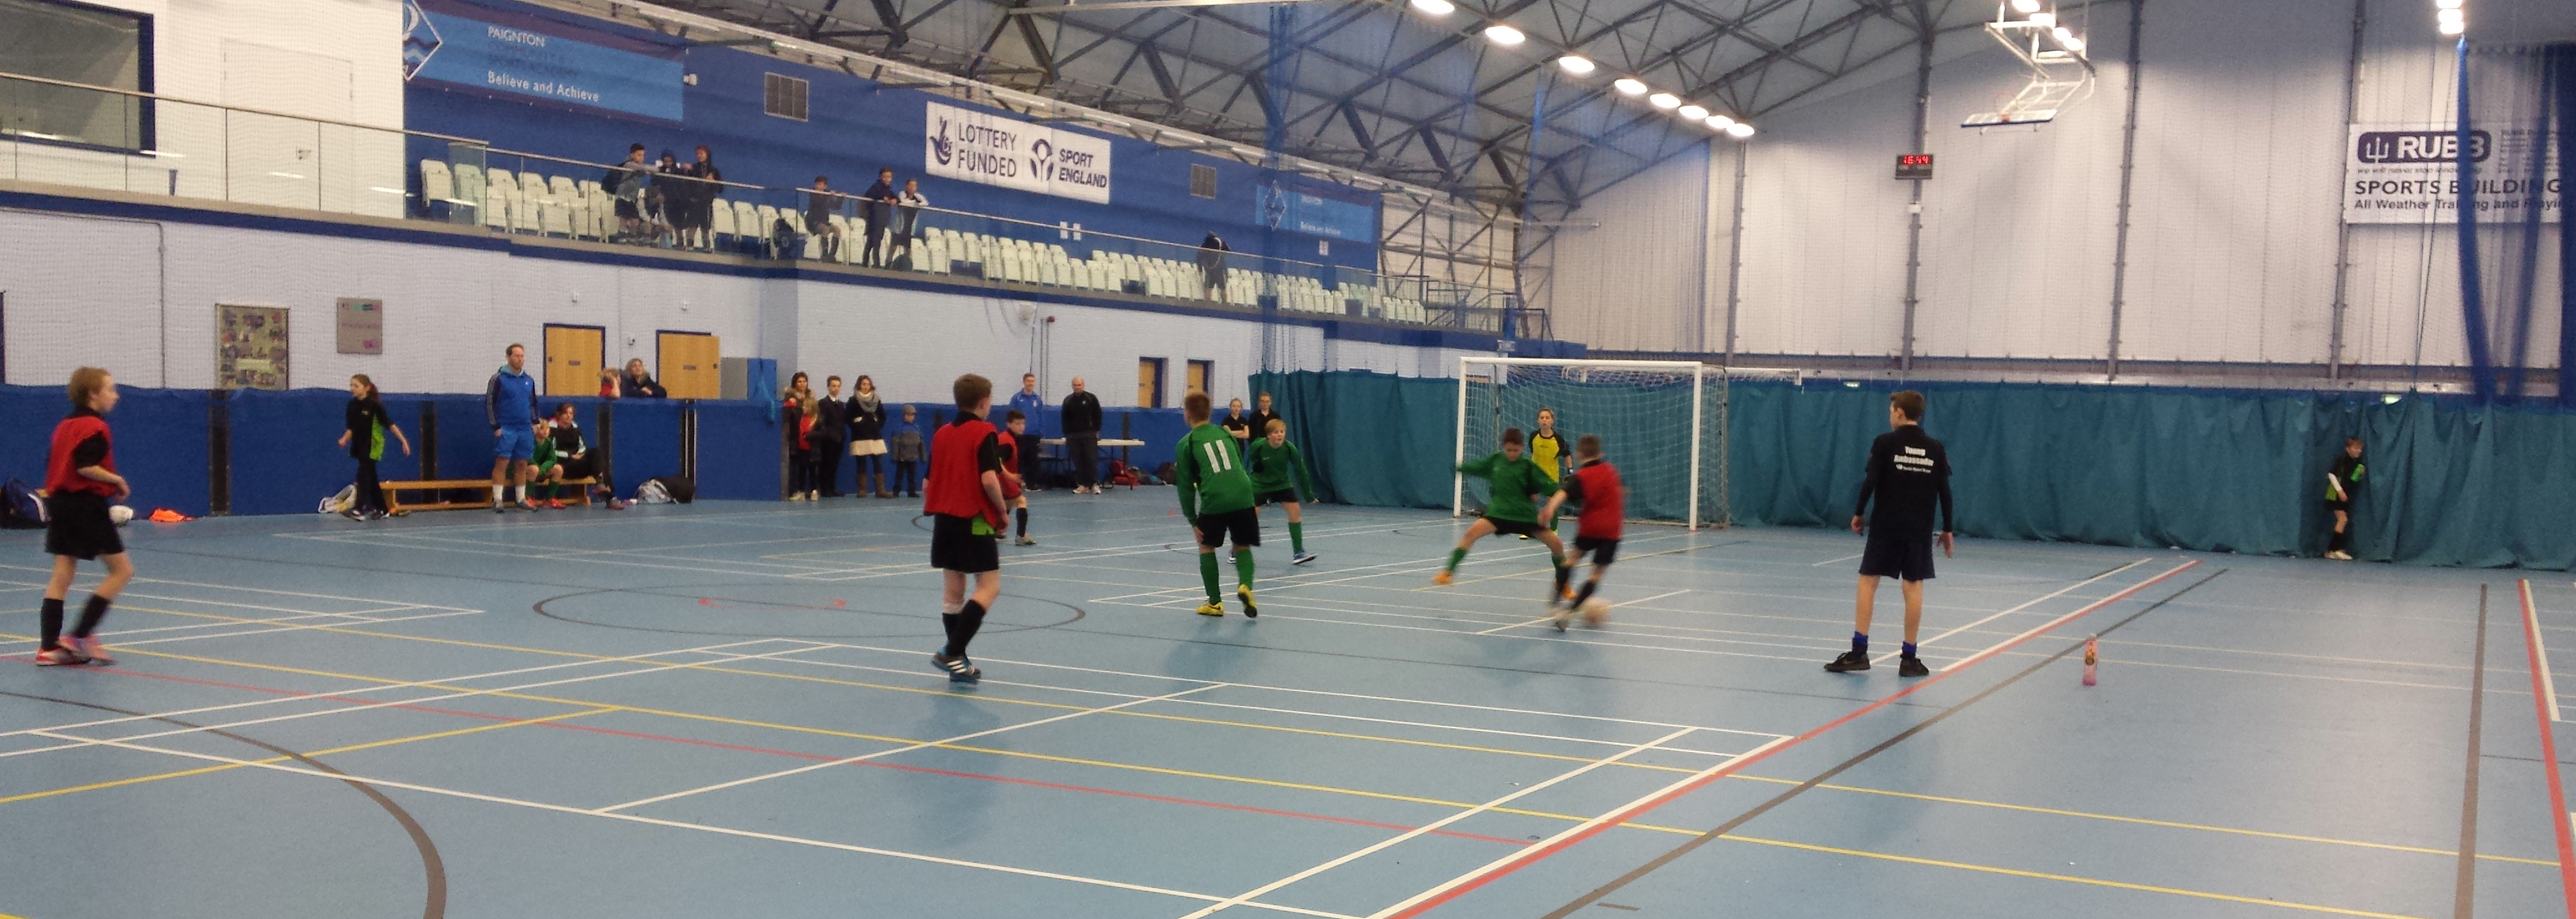 U12 Futsal Fever hits the Hub!